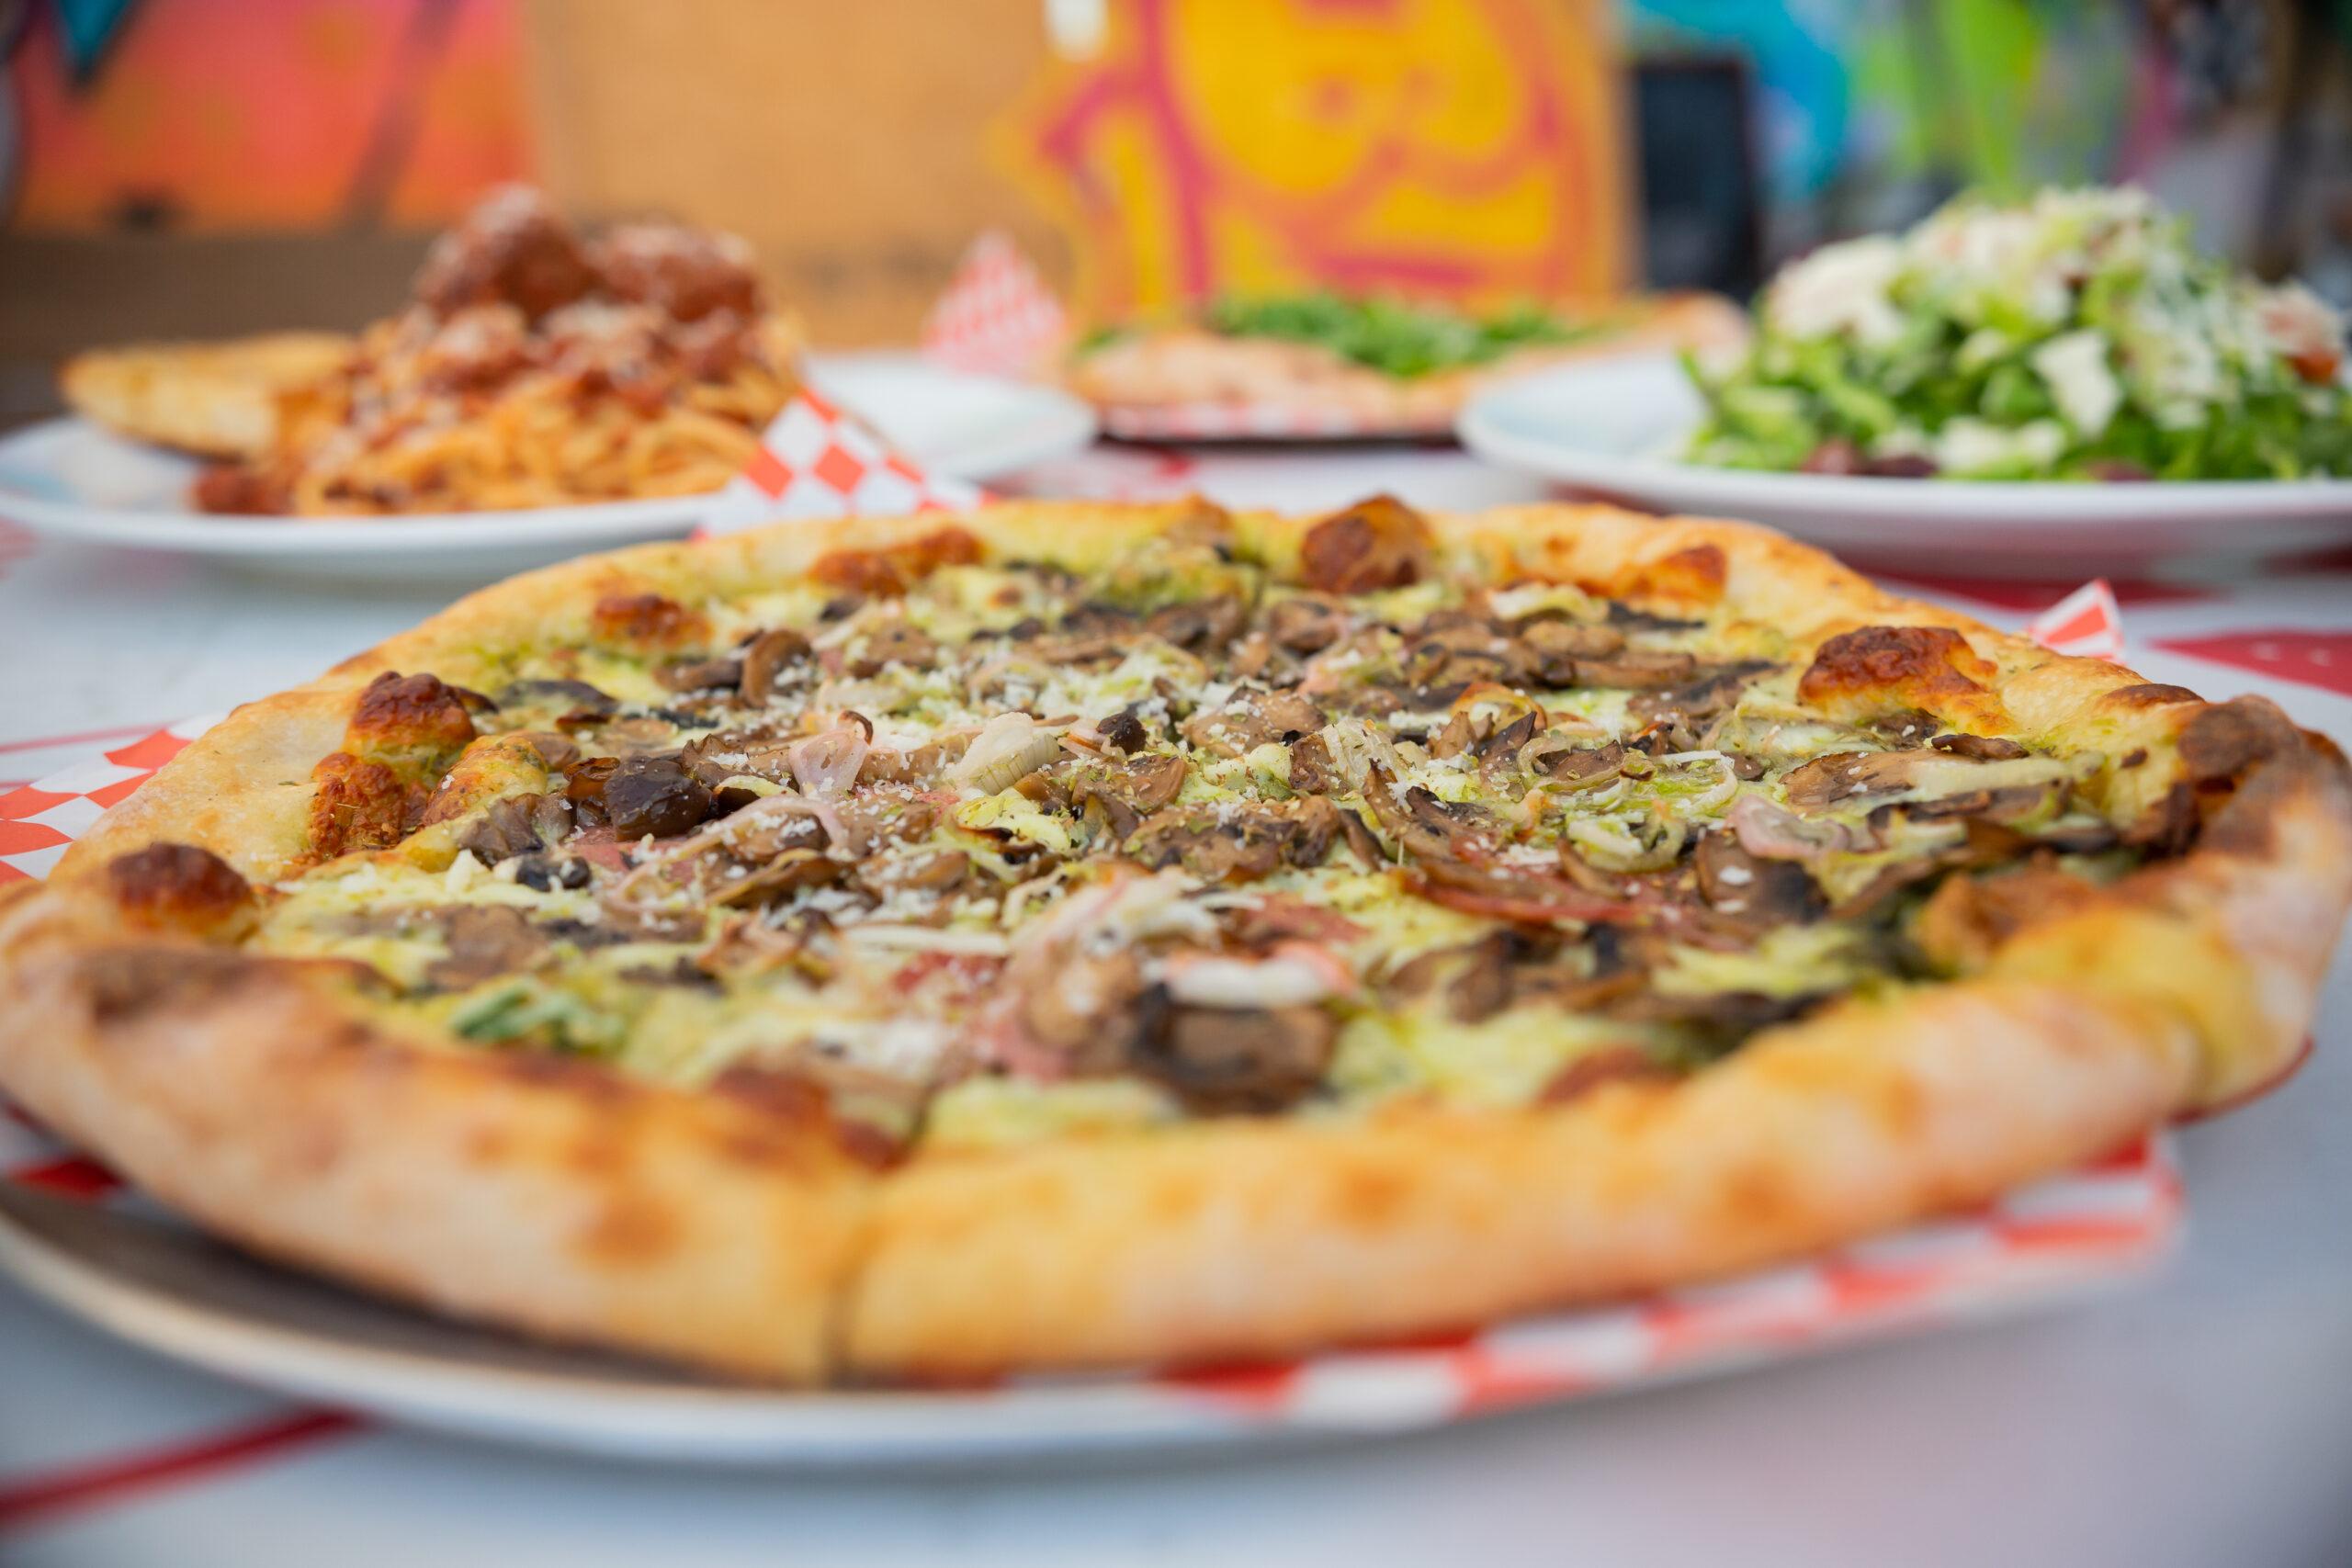 Pizza, pasta, salad & fun!